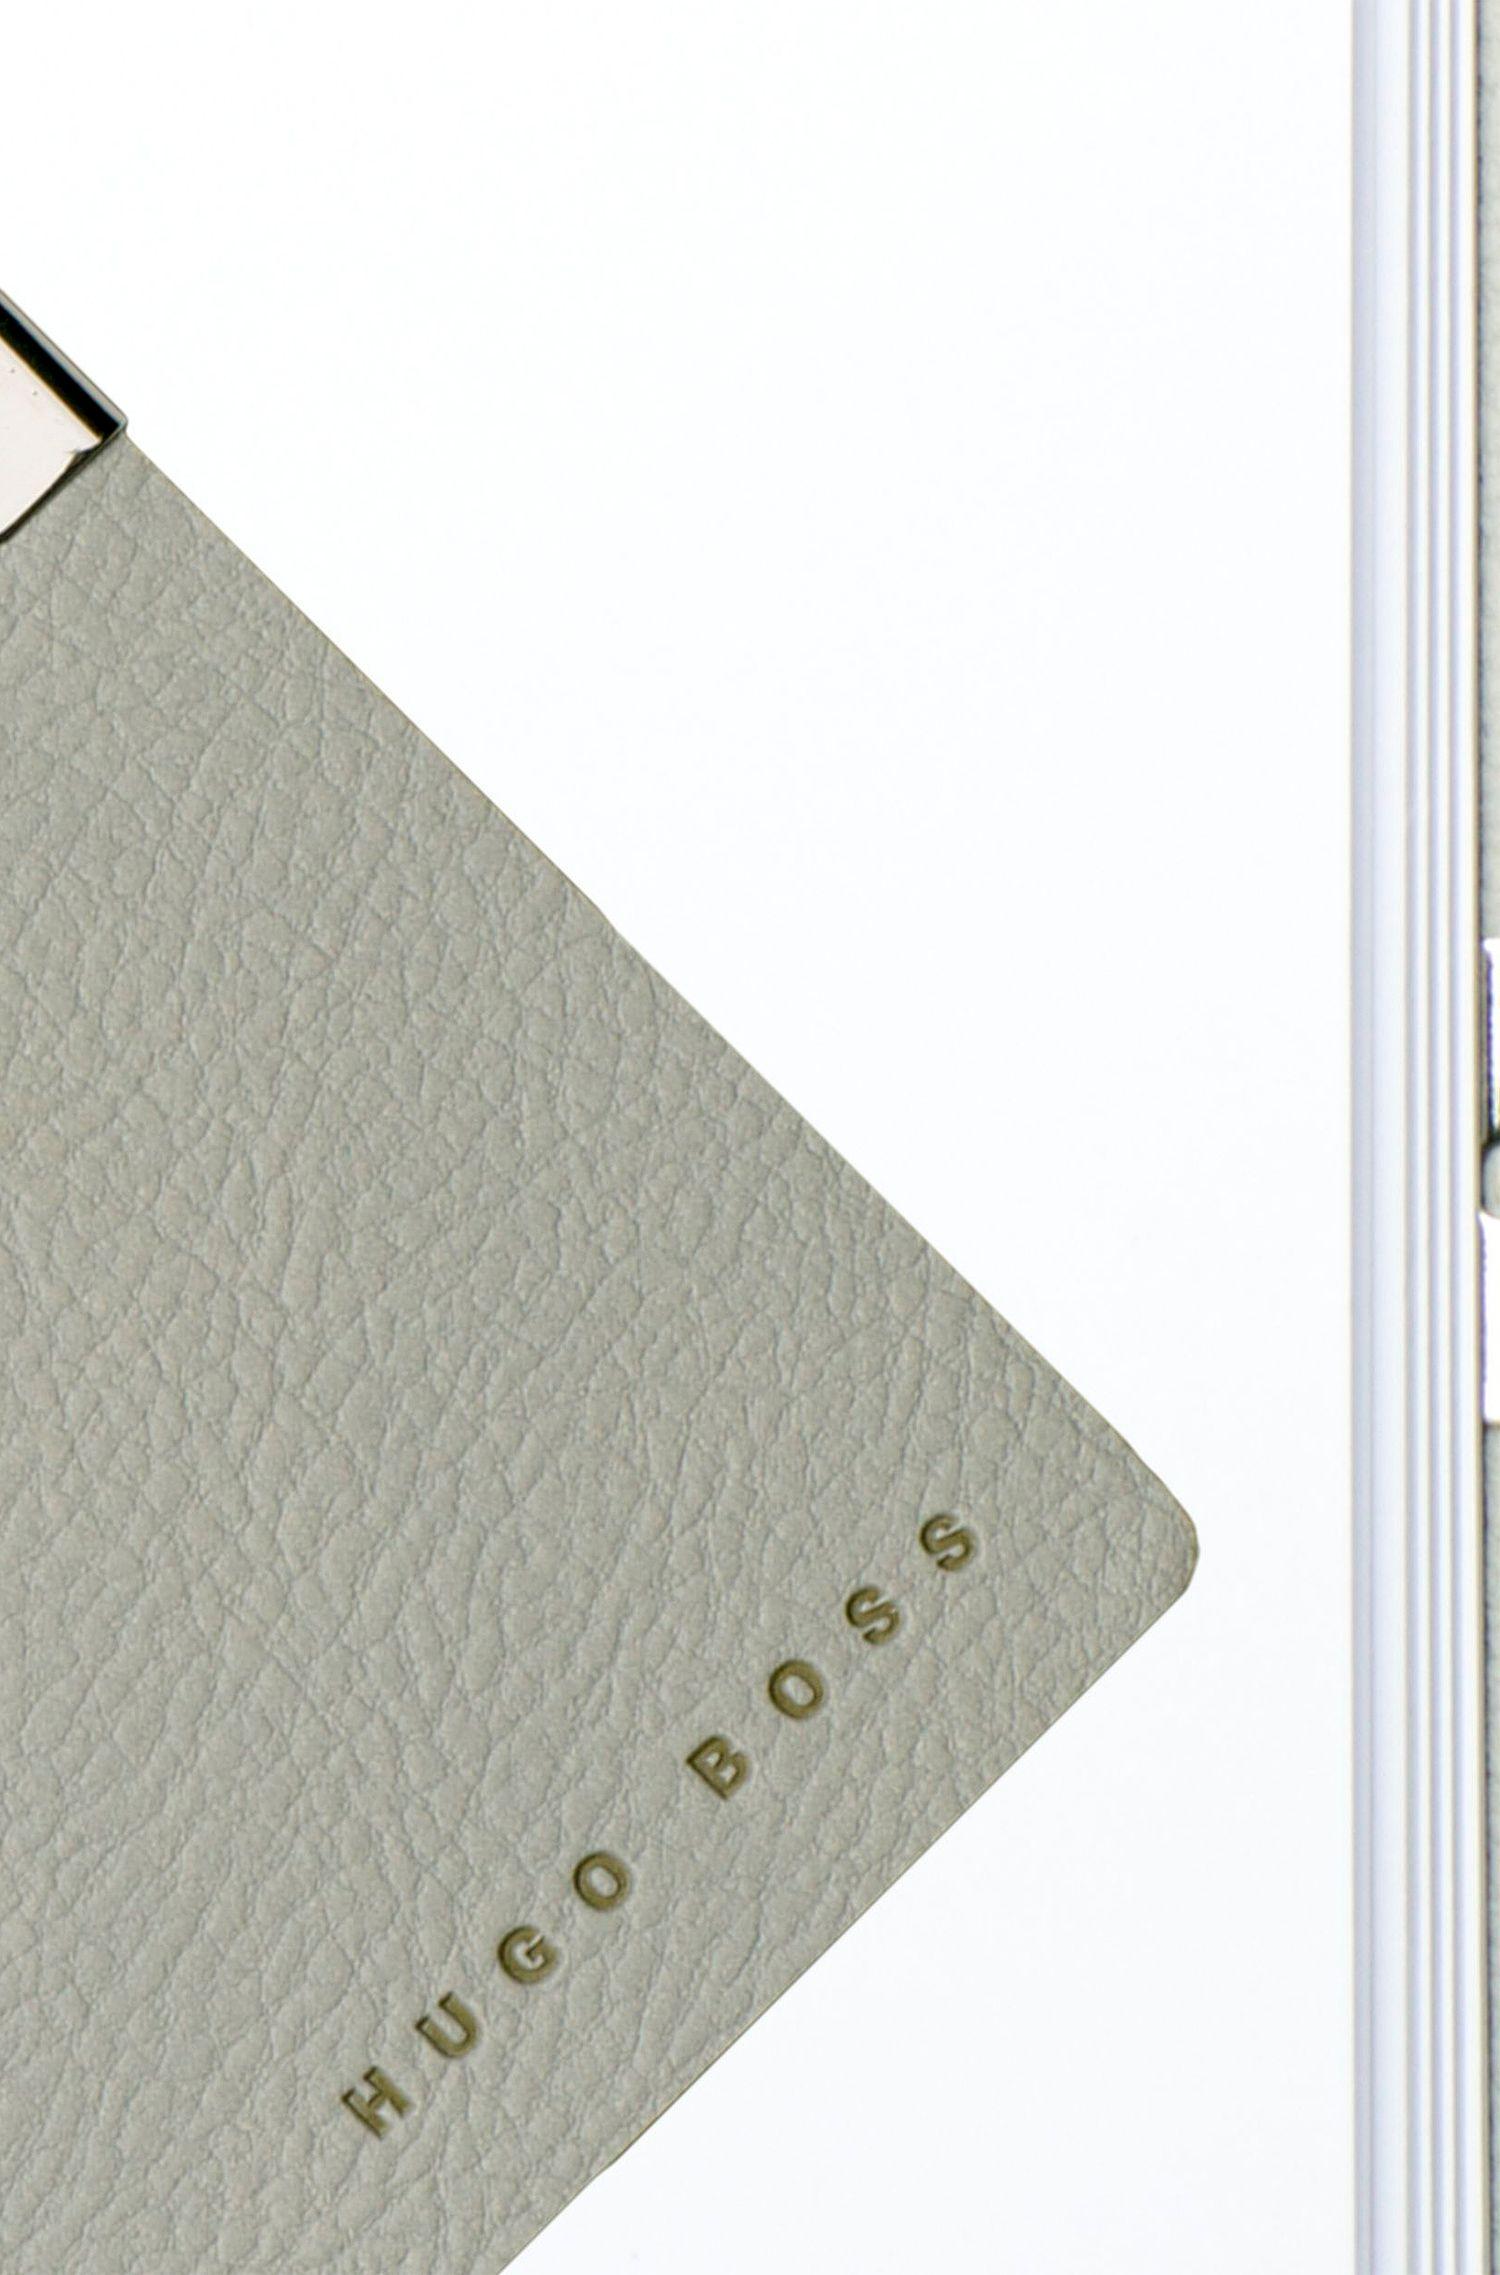 Carnet A6 en similicuir gris clair